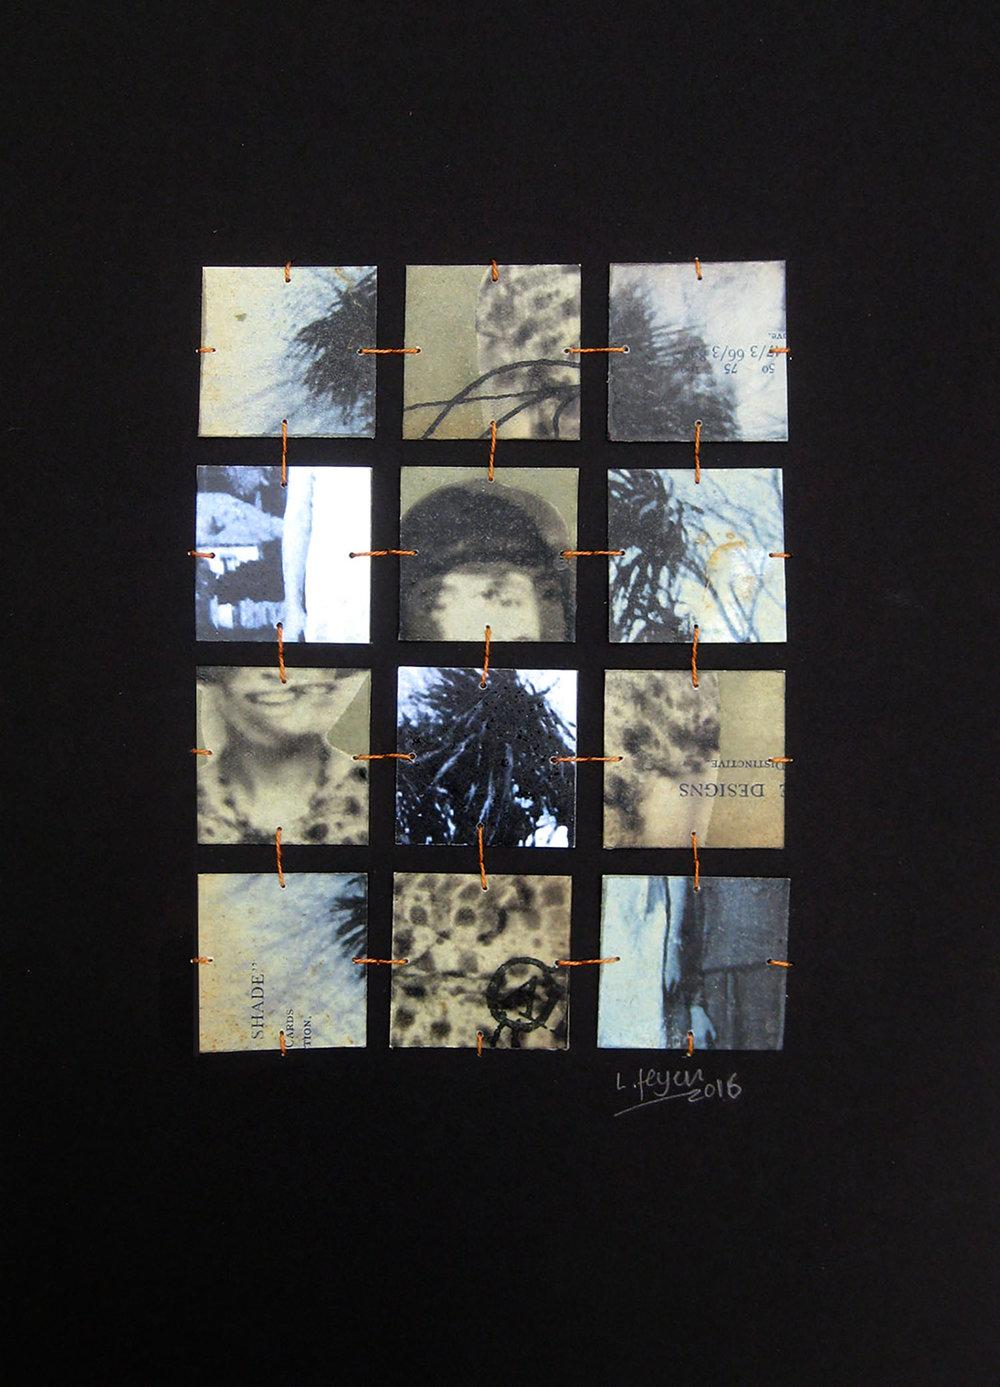 Threads-of-consciousness-II-by-Lisa-Feyen